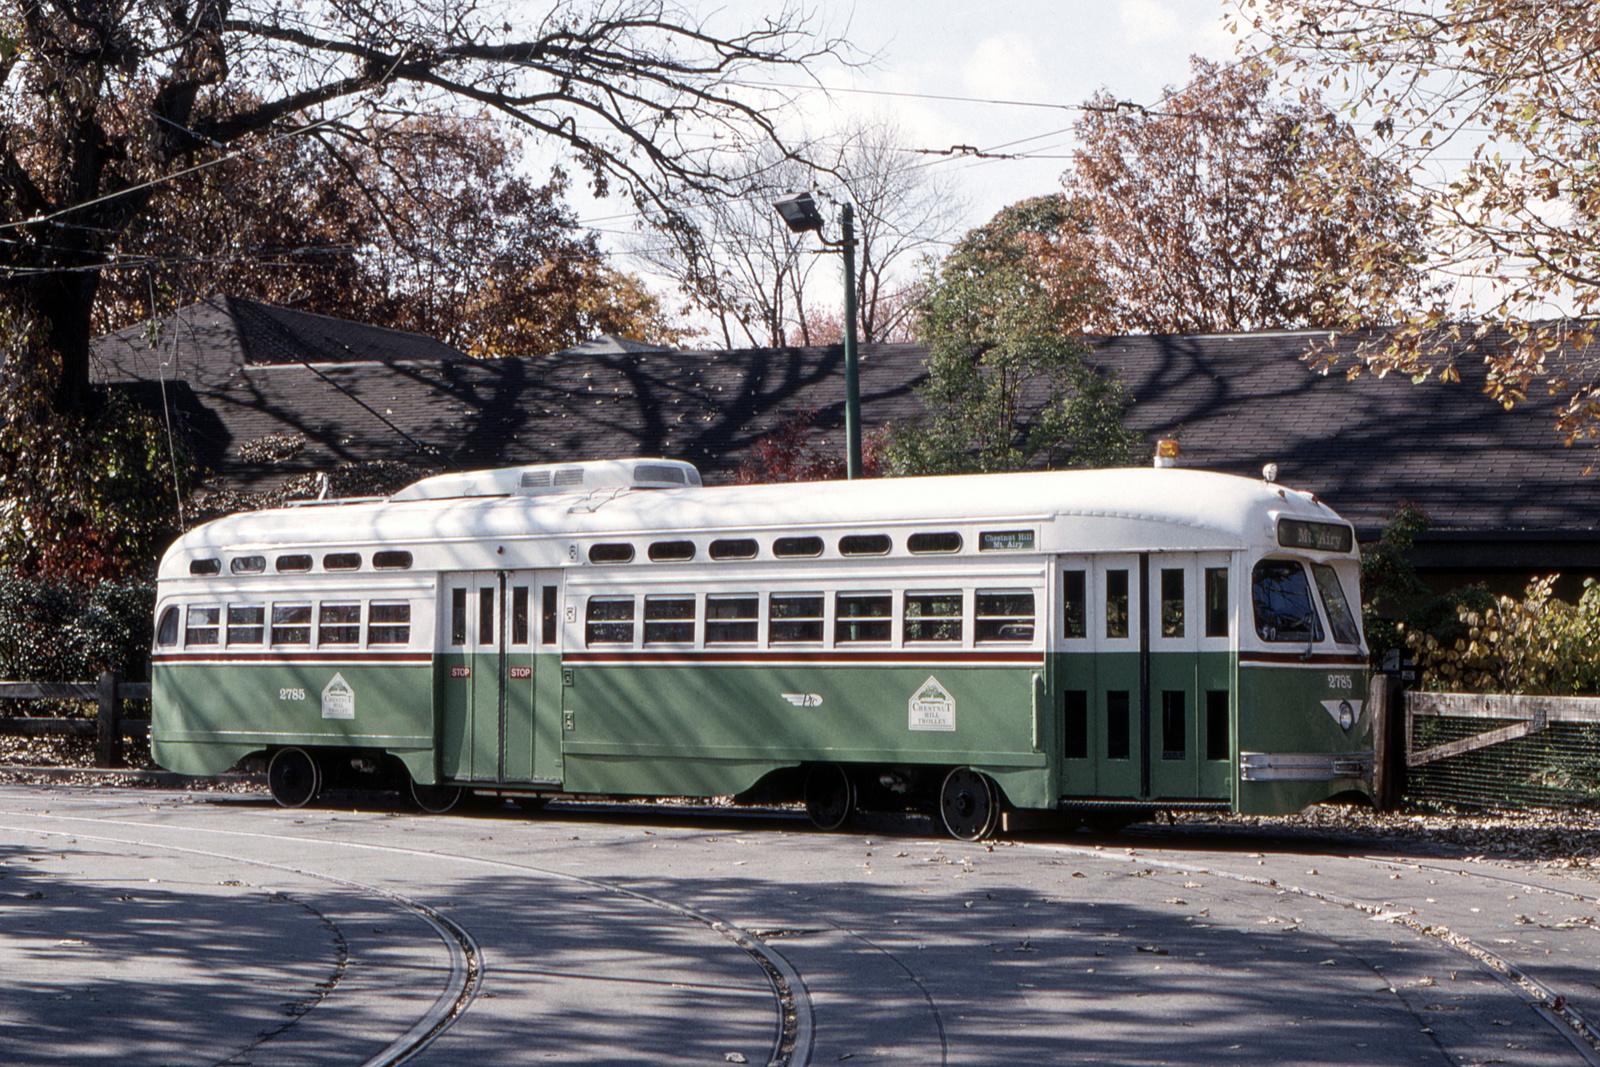 (1148k, 1600x1067)<br><b>Country:</b> United States<br><b>City:</b> Philadelphia, PA<br><b>System:</b> SEPTA (or Predecessor)<br><b>Line:</b> Rt. 23-Germantown<br><b>Location:</b> Bethlehem Pike/Chestnut Hill Loop<br><b>Car:</b> PTC/SEPTA Postwar All-electric PCC (St.Louis, 1947) 2785 <br><b>Collection of:</b> David Pirmann<br><b>Date:</b> 10/1990<br><b>Viewed (this week/total):</b> 0 / 66